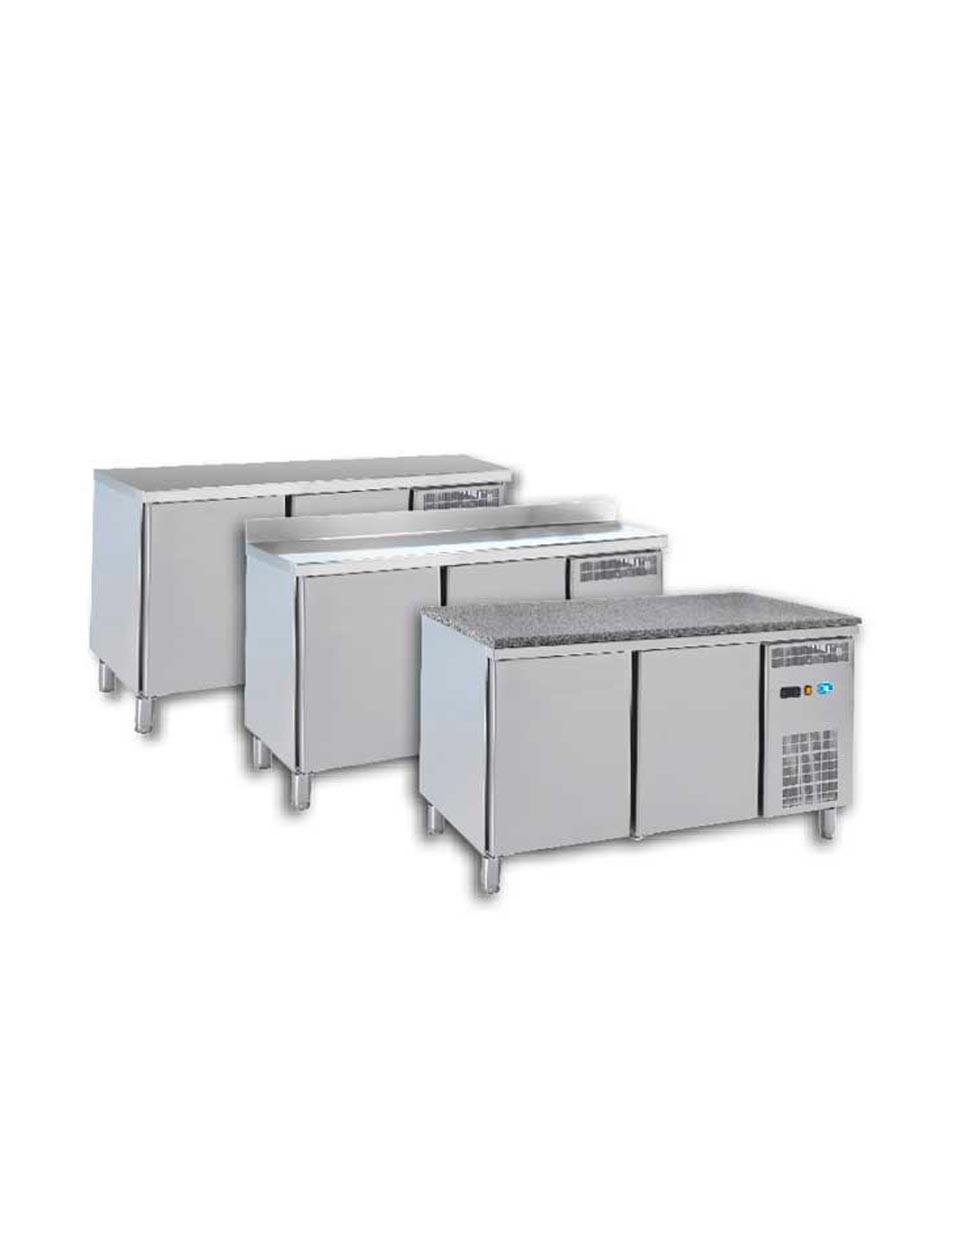 Euronorme - Froid statique/ventilé Commutable - Groupe extractible - Prof. 800 mm